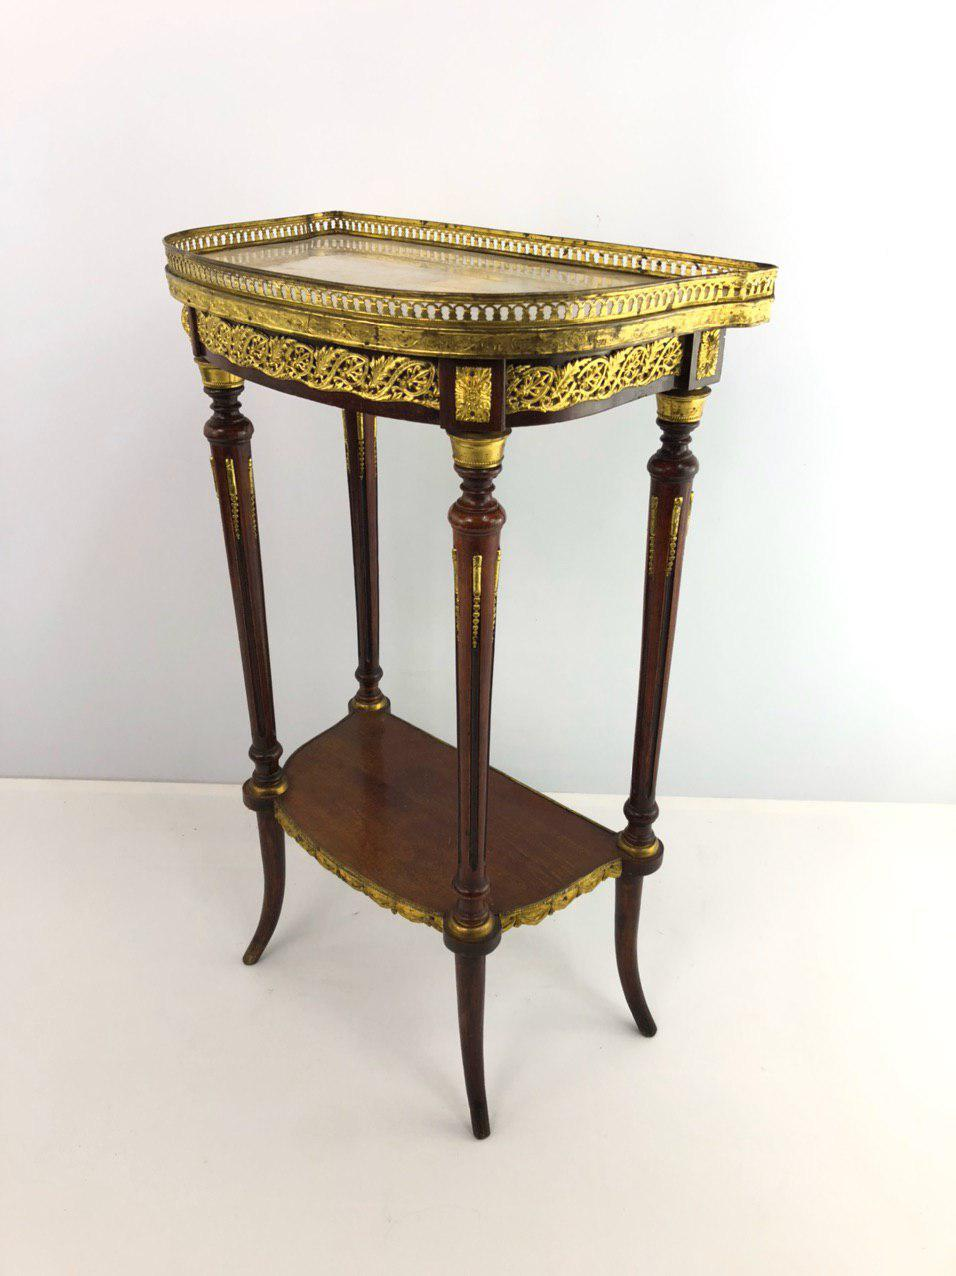 Антикварный столик эпохи Наполеона III